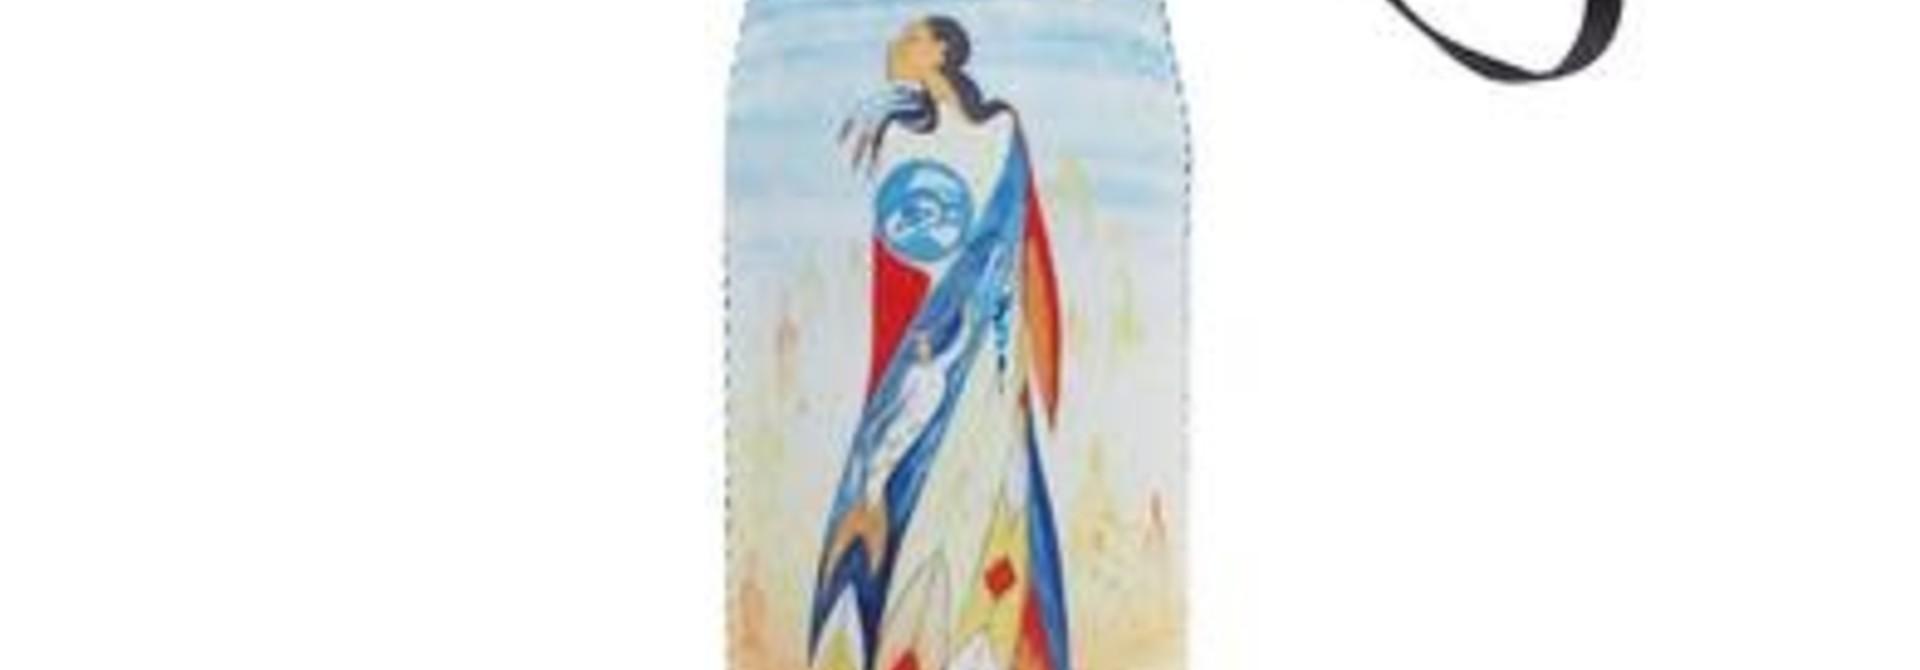 Thermal Bottle in Sleeve- Not Forgotten by Maxine Noel